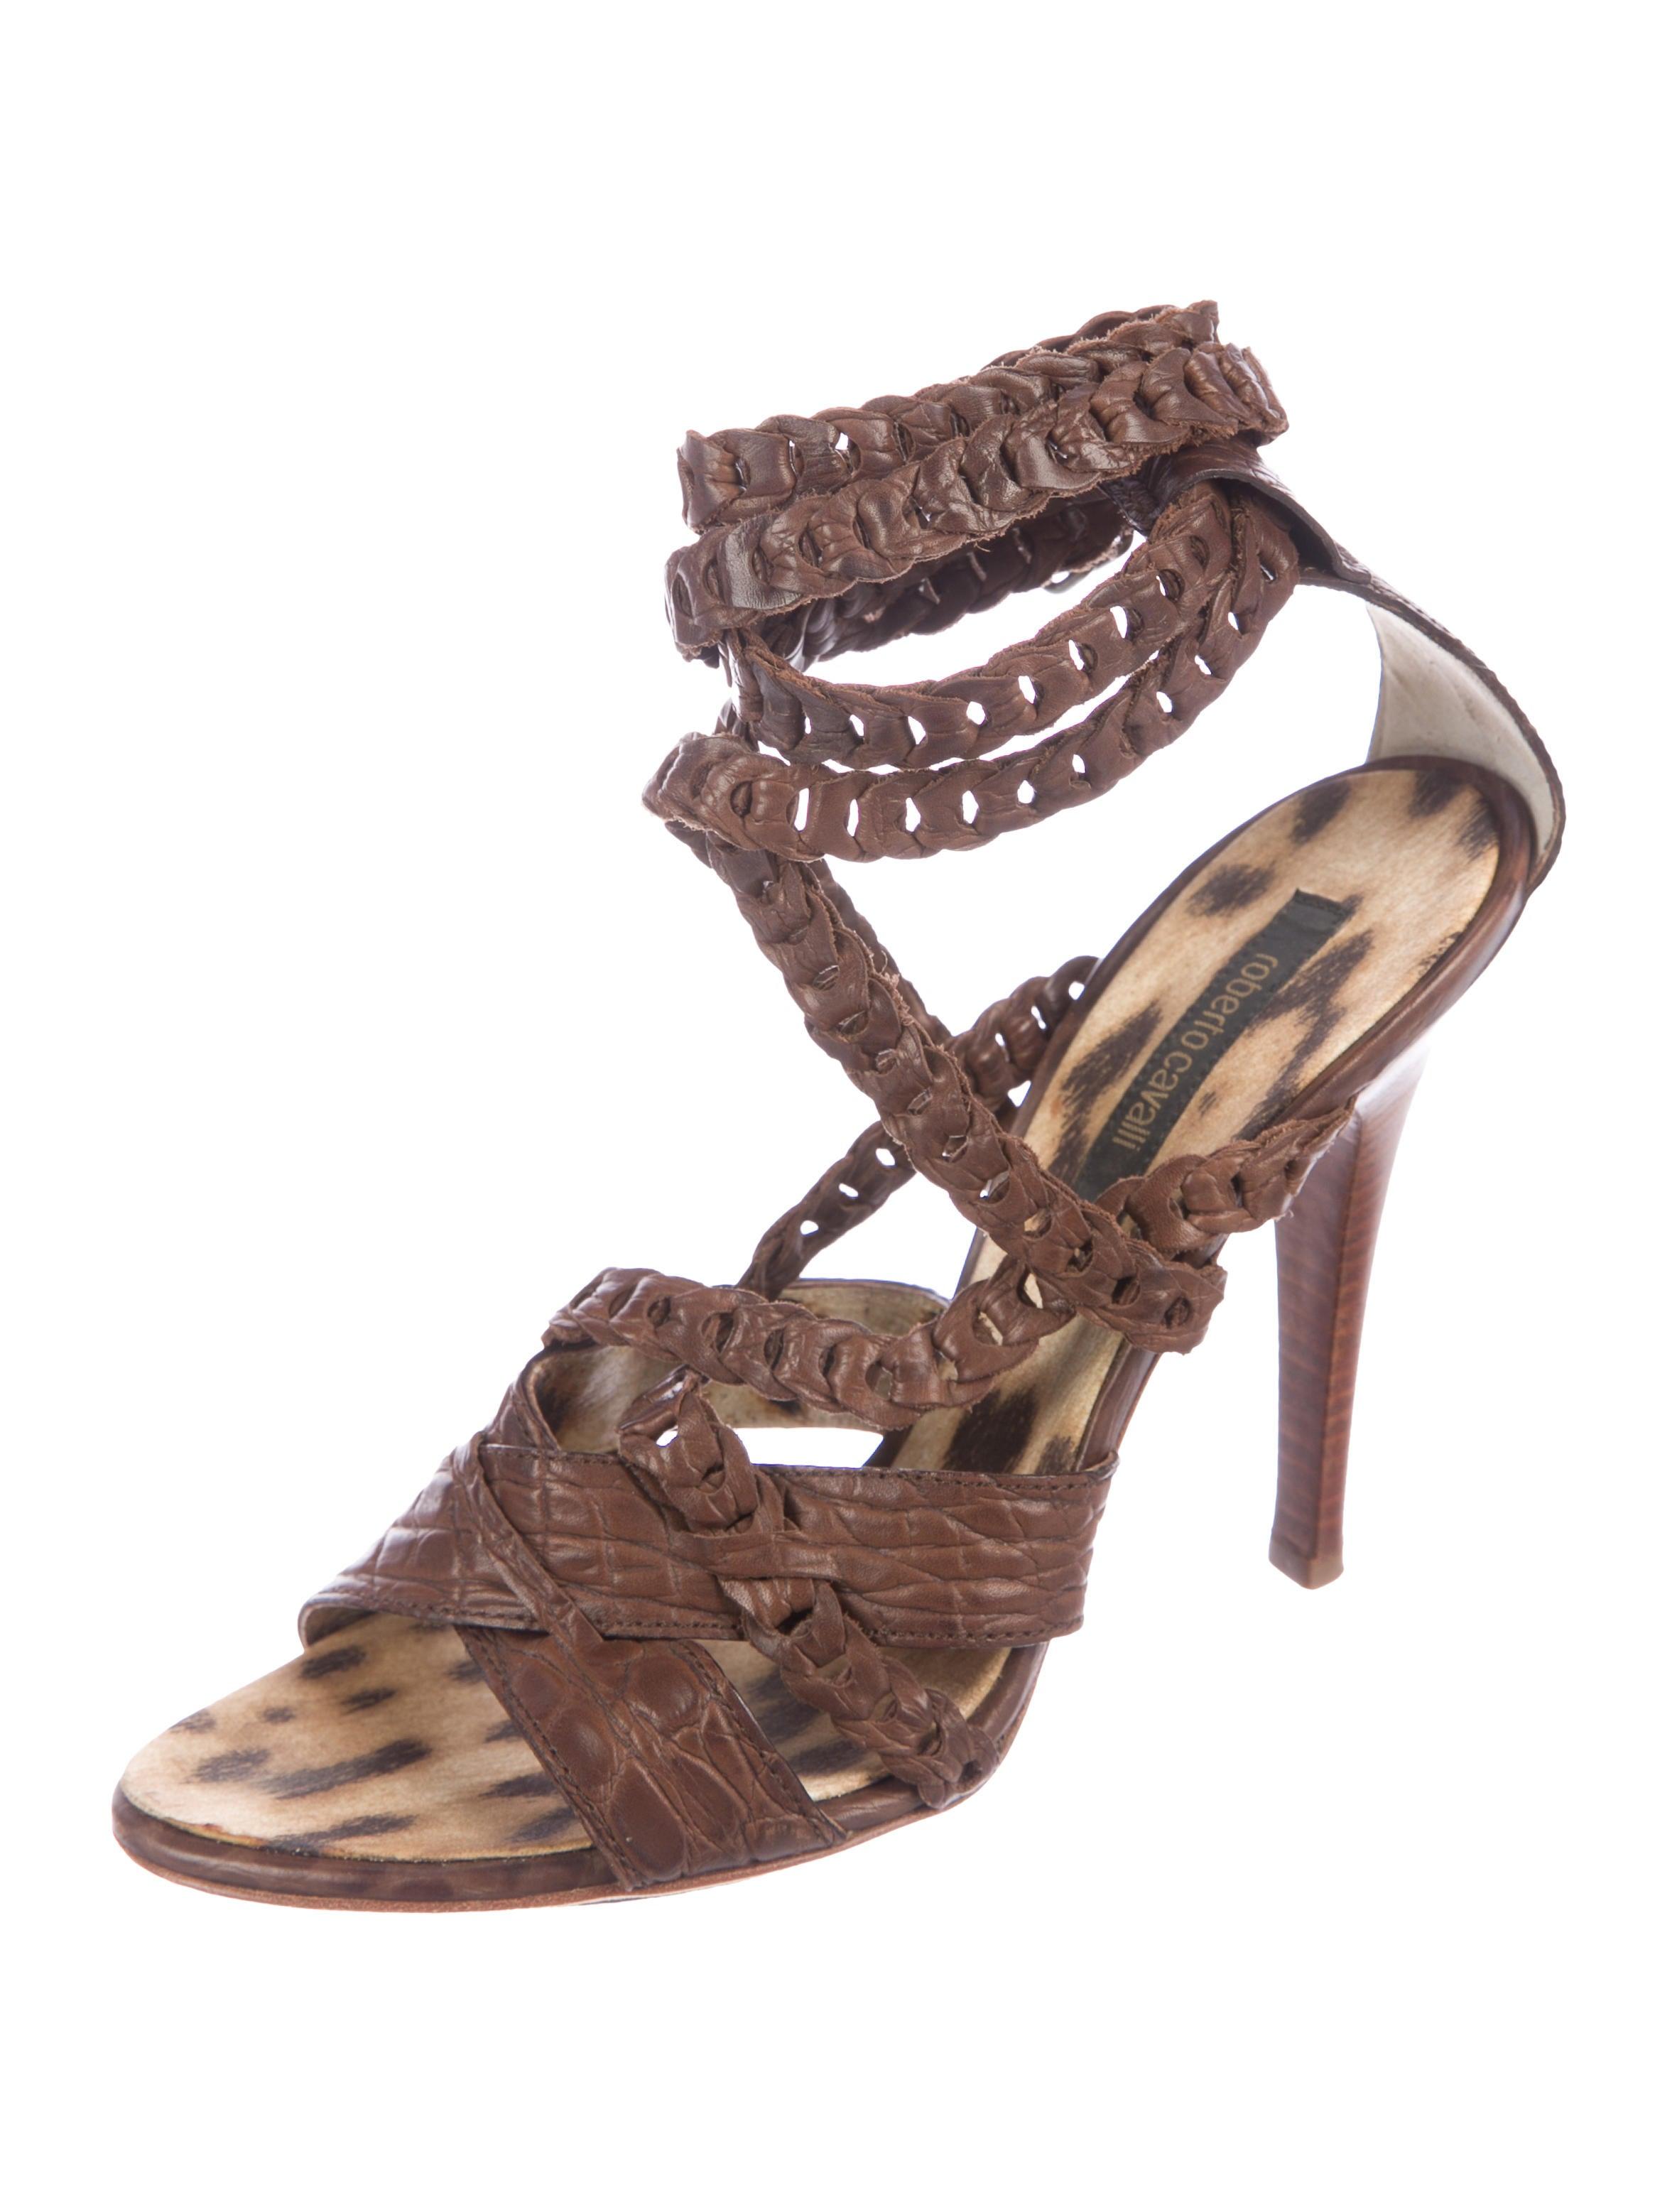 cheap sale footlocker finishline Roberto Cavalli Embossed Multistrap Sandals under 50 dollars sale websites OzFQeeTv